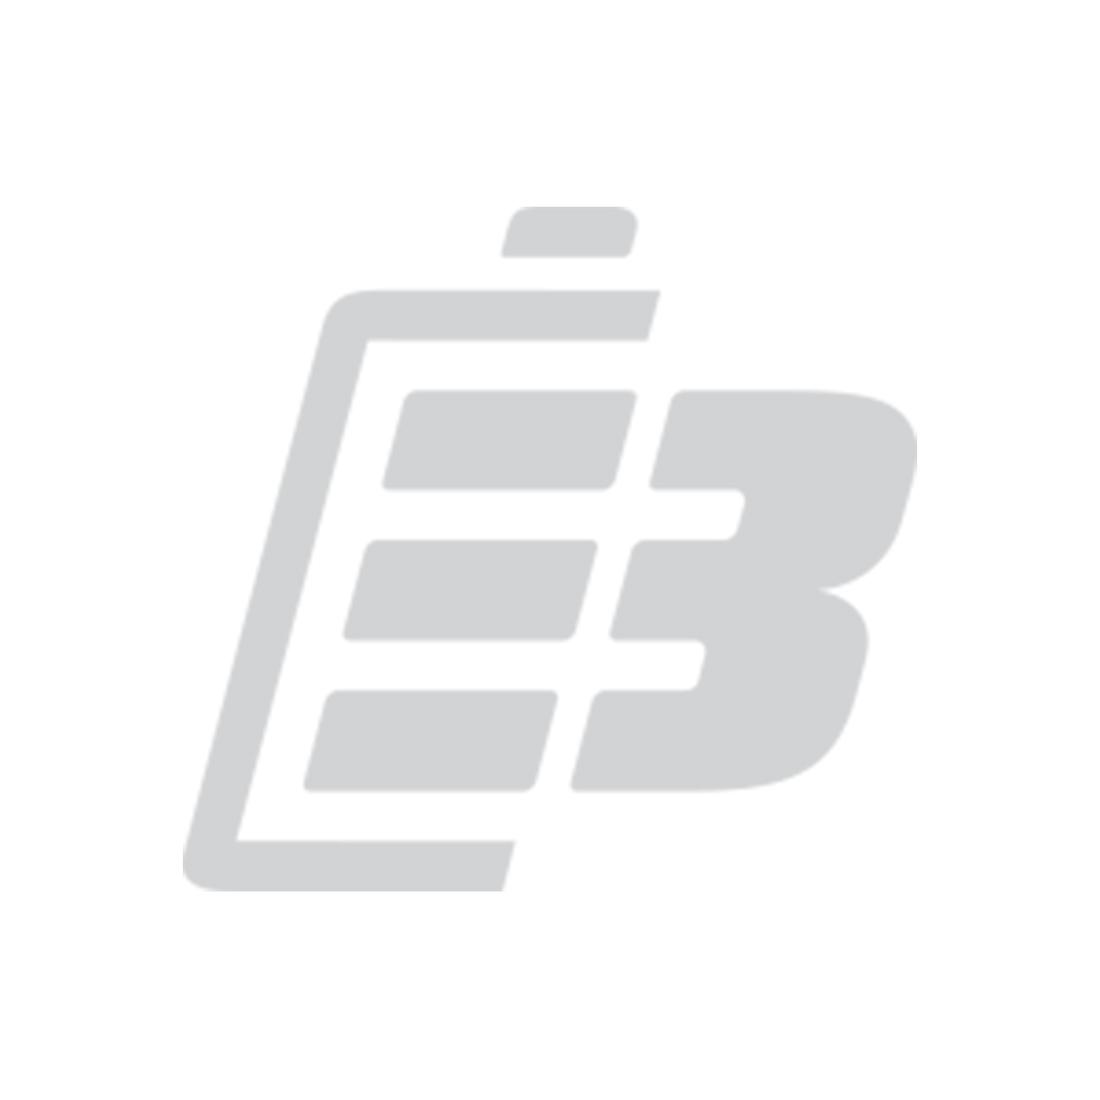 Fenix 18650 ARB-L18-3500 battery 3500mAh 1